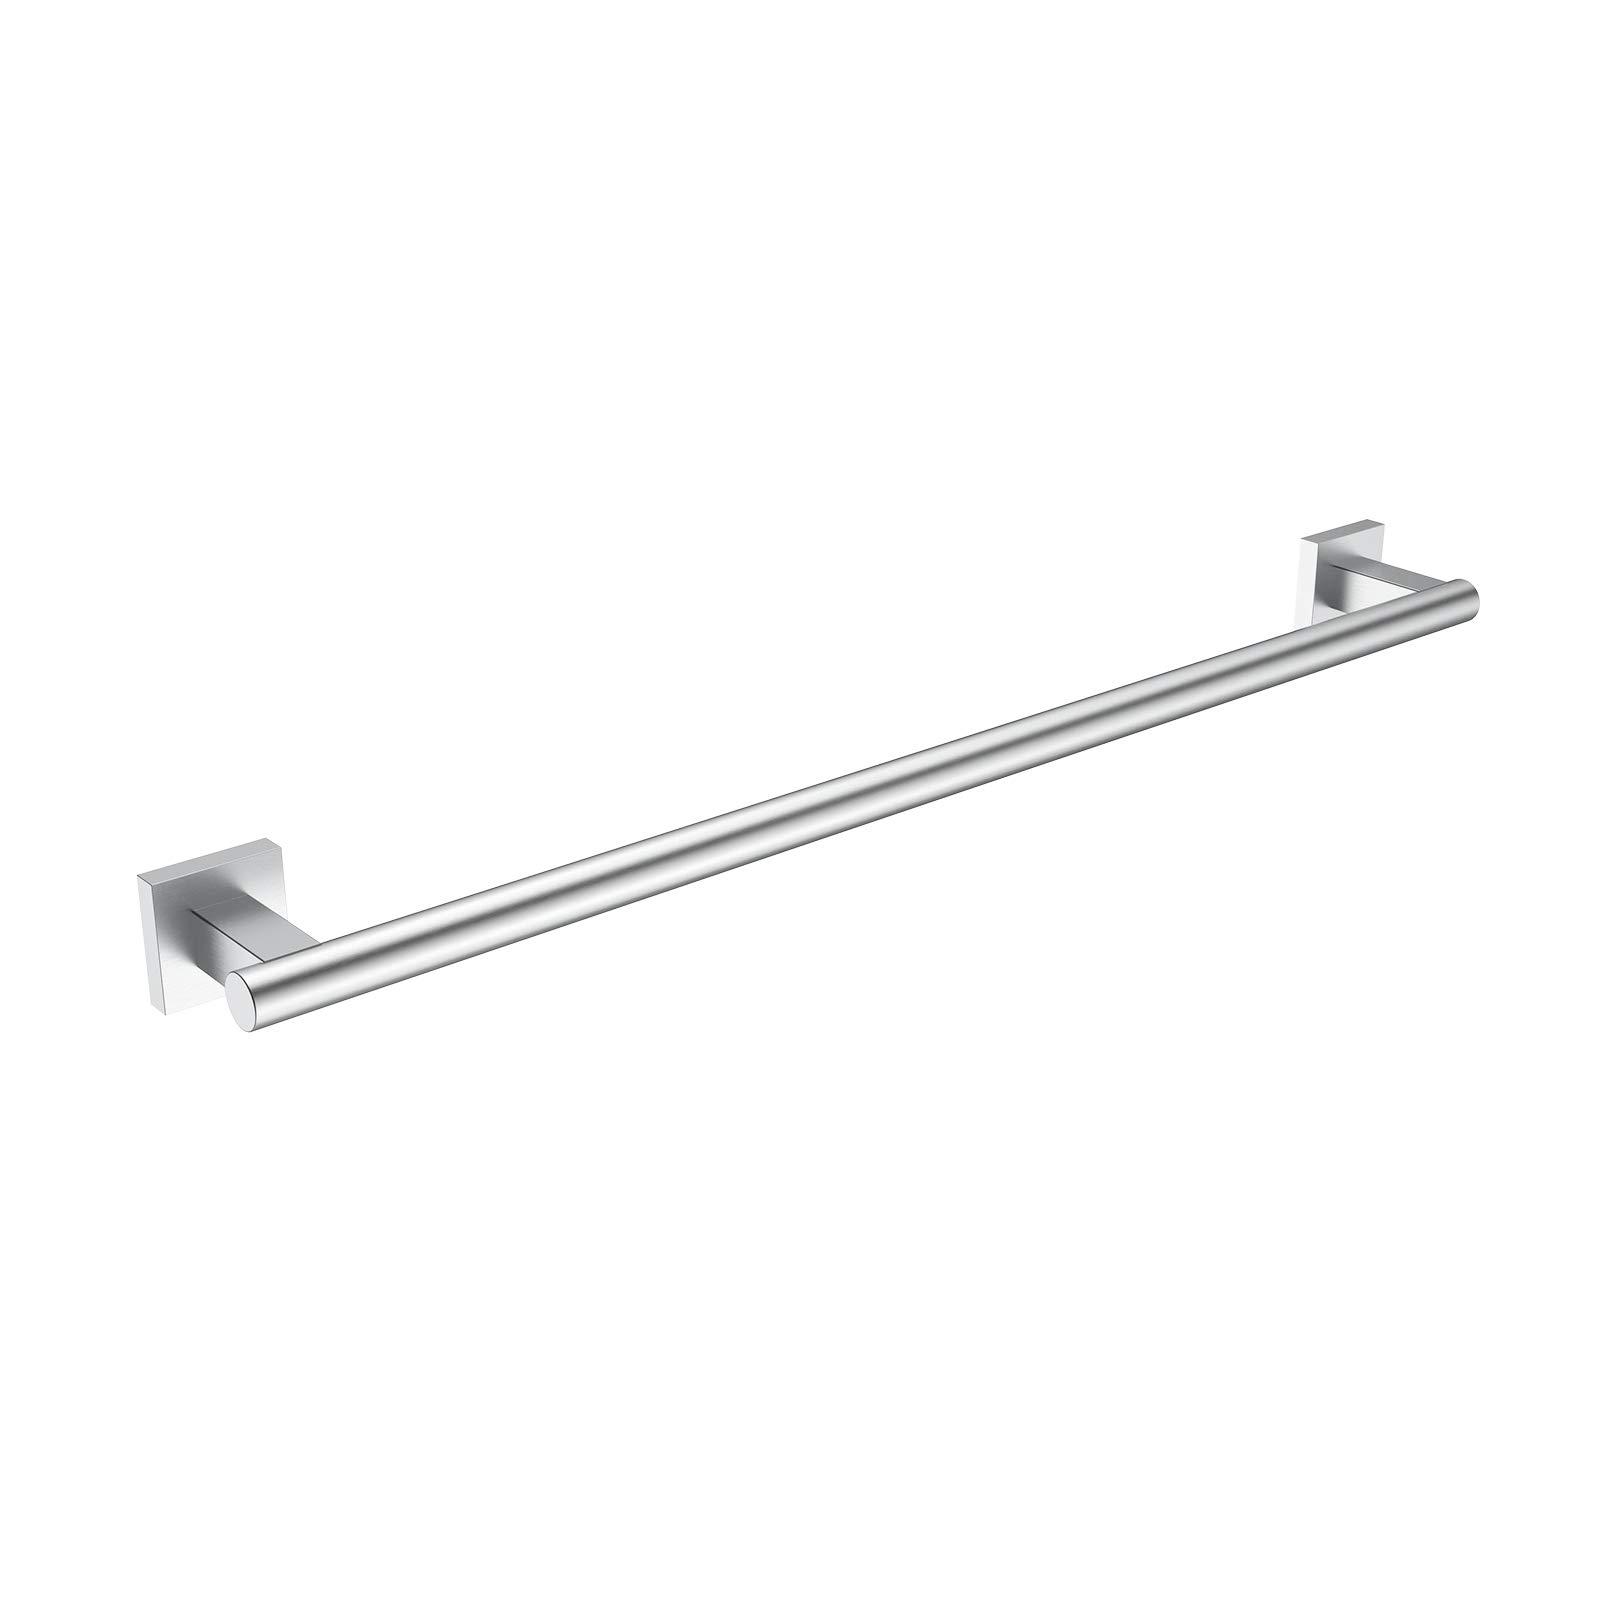 HOMGIF 24-Inch Towel Bar Rack SUS 304 Stainless Steel Brushed Finish Wall Mounted Bath Shelves Hanger (Single Bar)